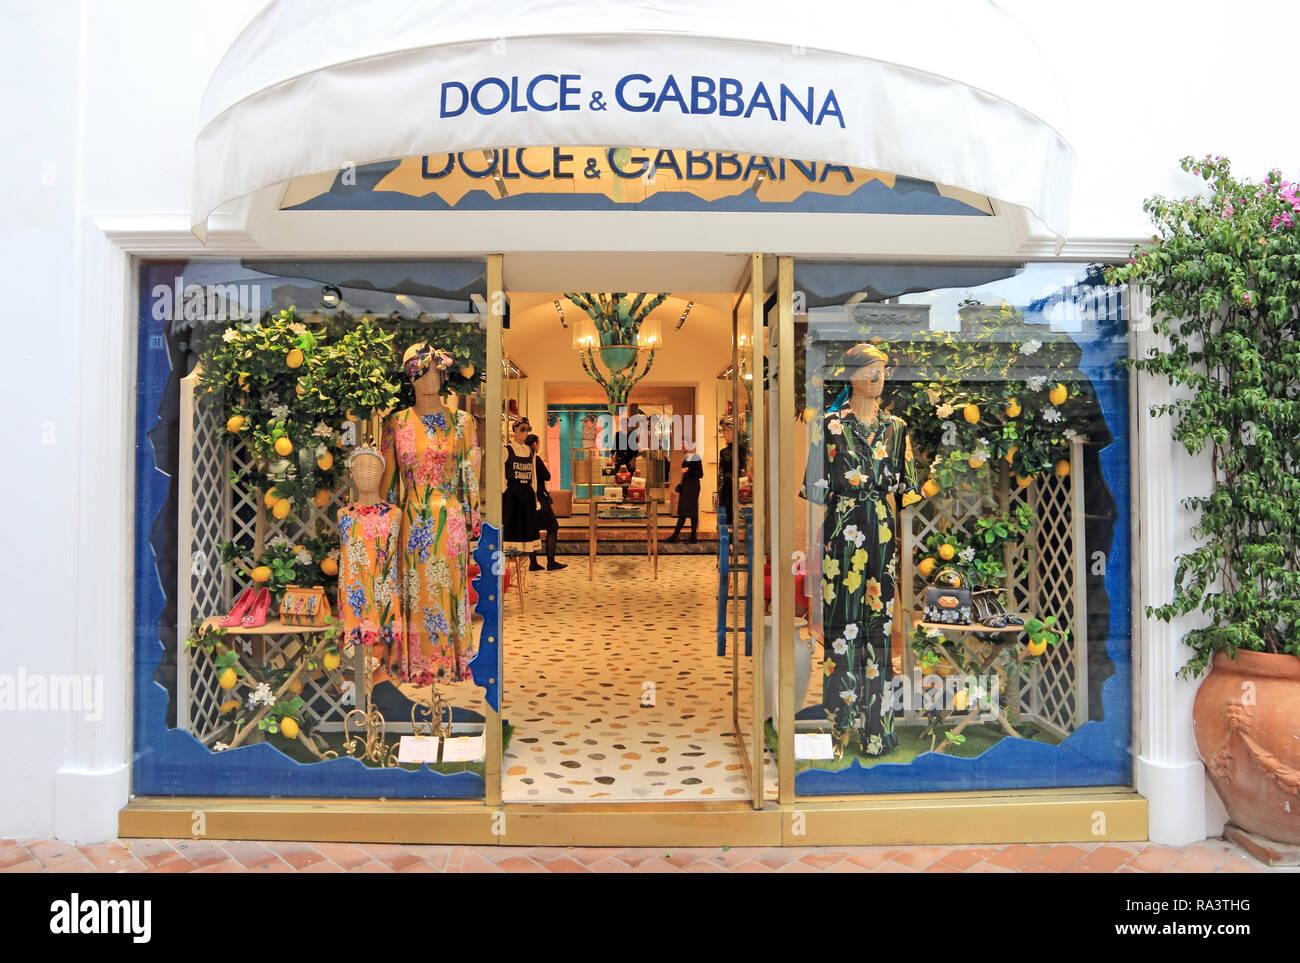 Dolce & Gabbana shop, Capri - Stock Image